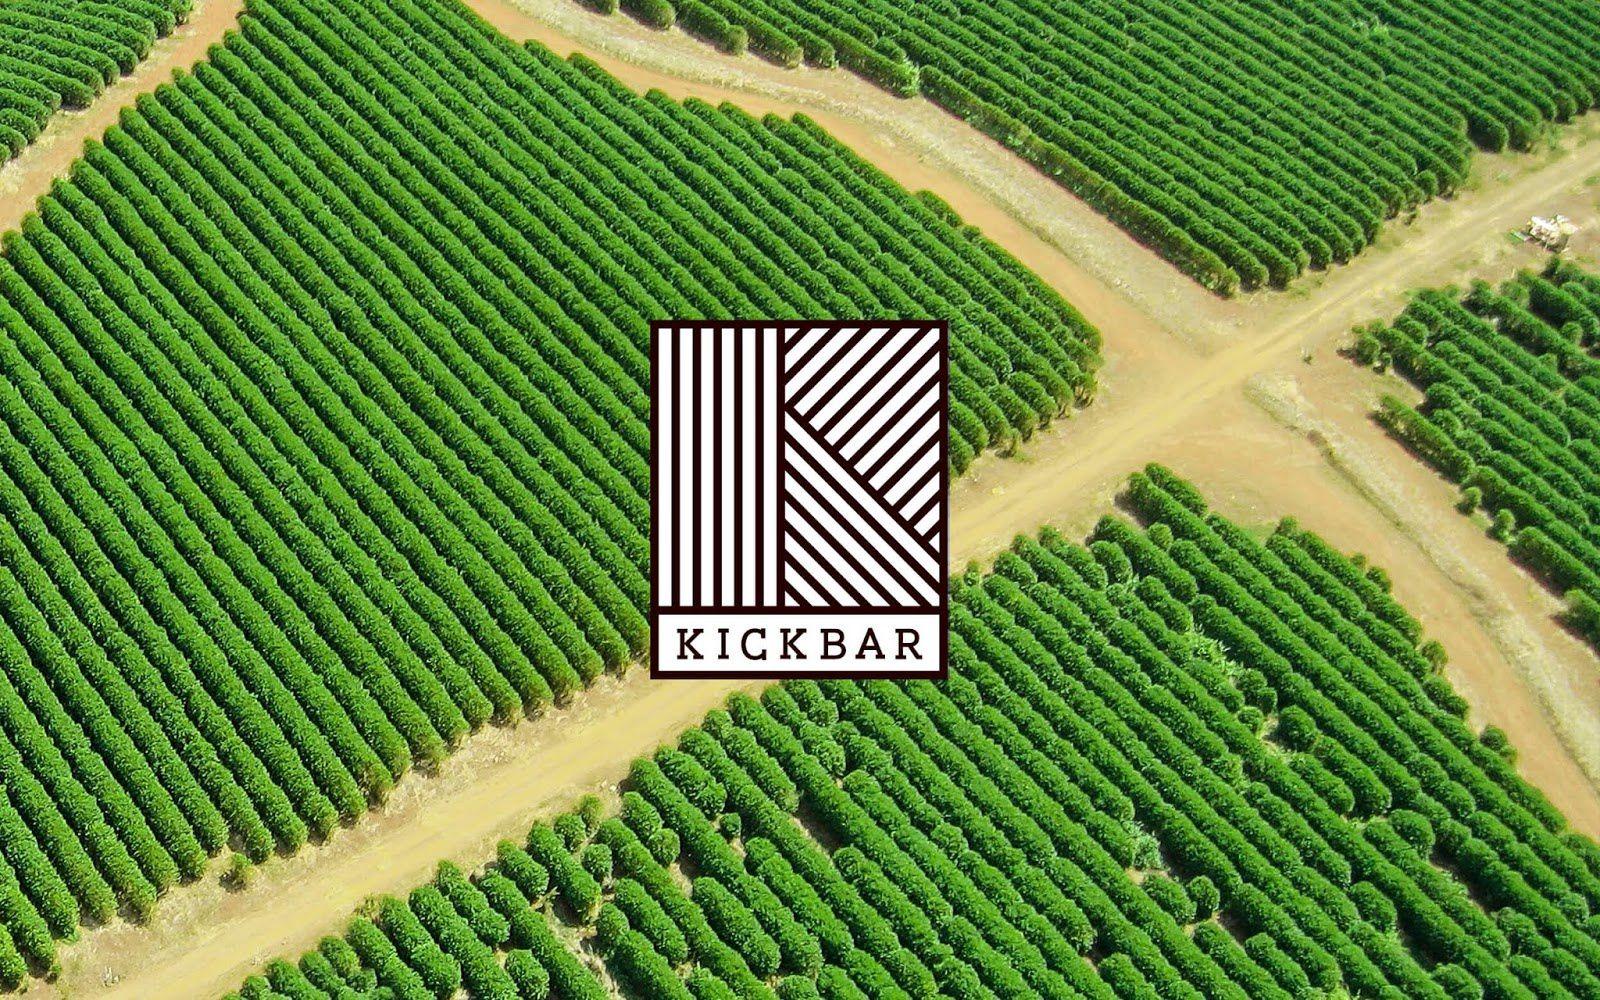 Kickbar (tablette de café pur) I Design (concept) : Jens Marklund, Etats-Unis (août 2019)